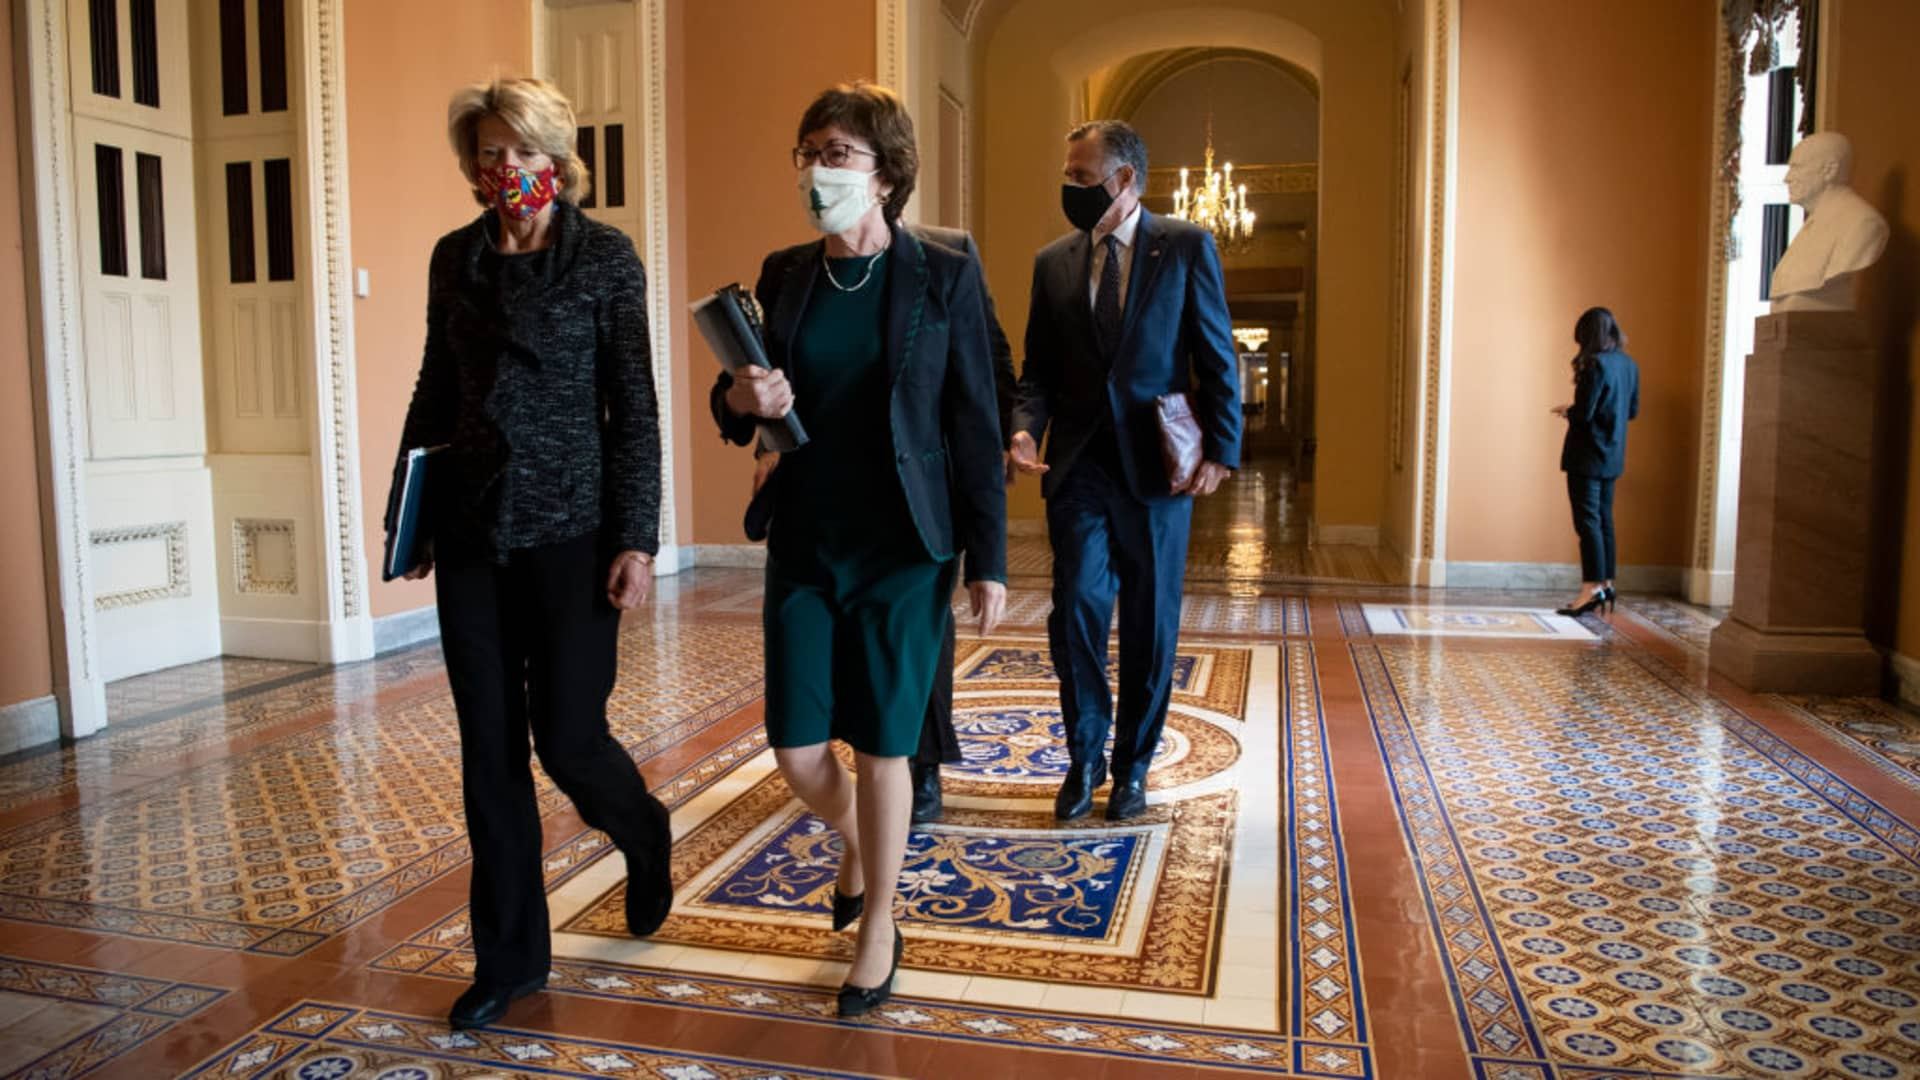 Sen. Lisa Murkowski, R-Alaska, left, Sen. Susan Collins, R-Maine, Sen. Bill Cassidy, R-La., and Sen. Mitt Romney, R-Utah, depart from a meeting with Senate Majority Leader Mitch McConnell, R-Ky., in his office in Washington on Thursday, Dec. 3, 2020.